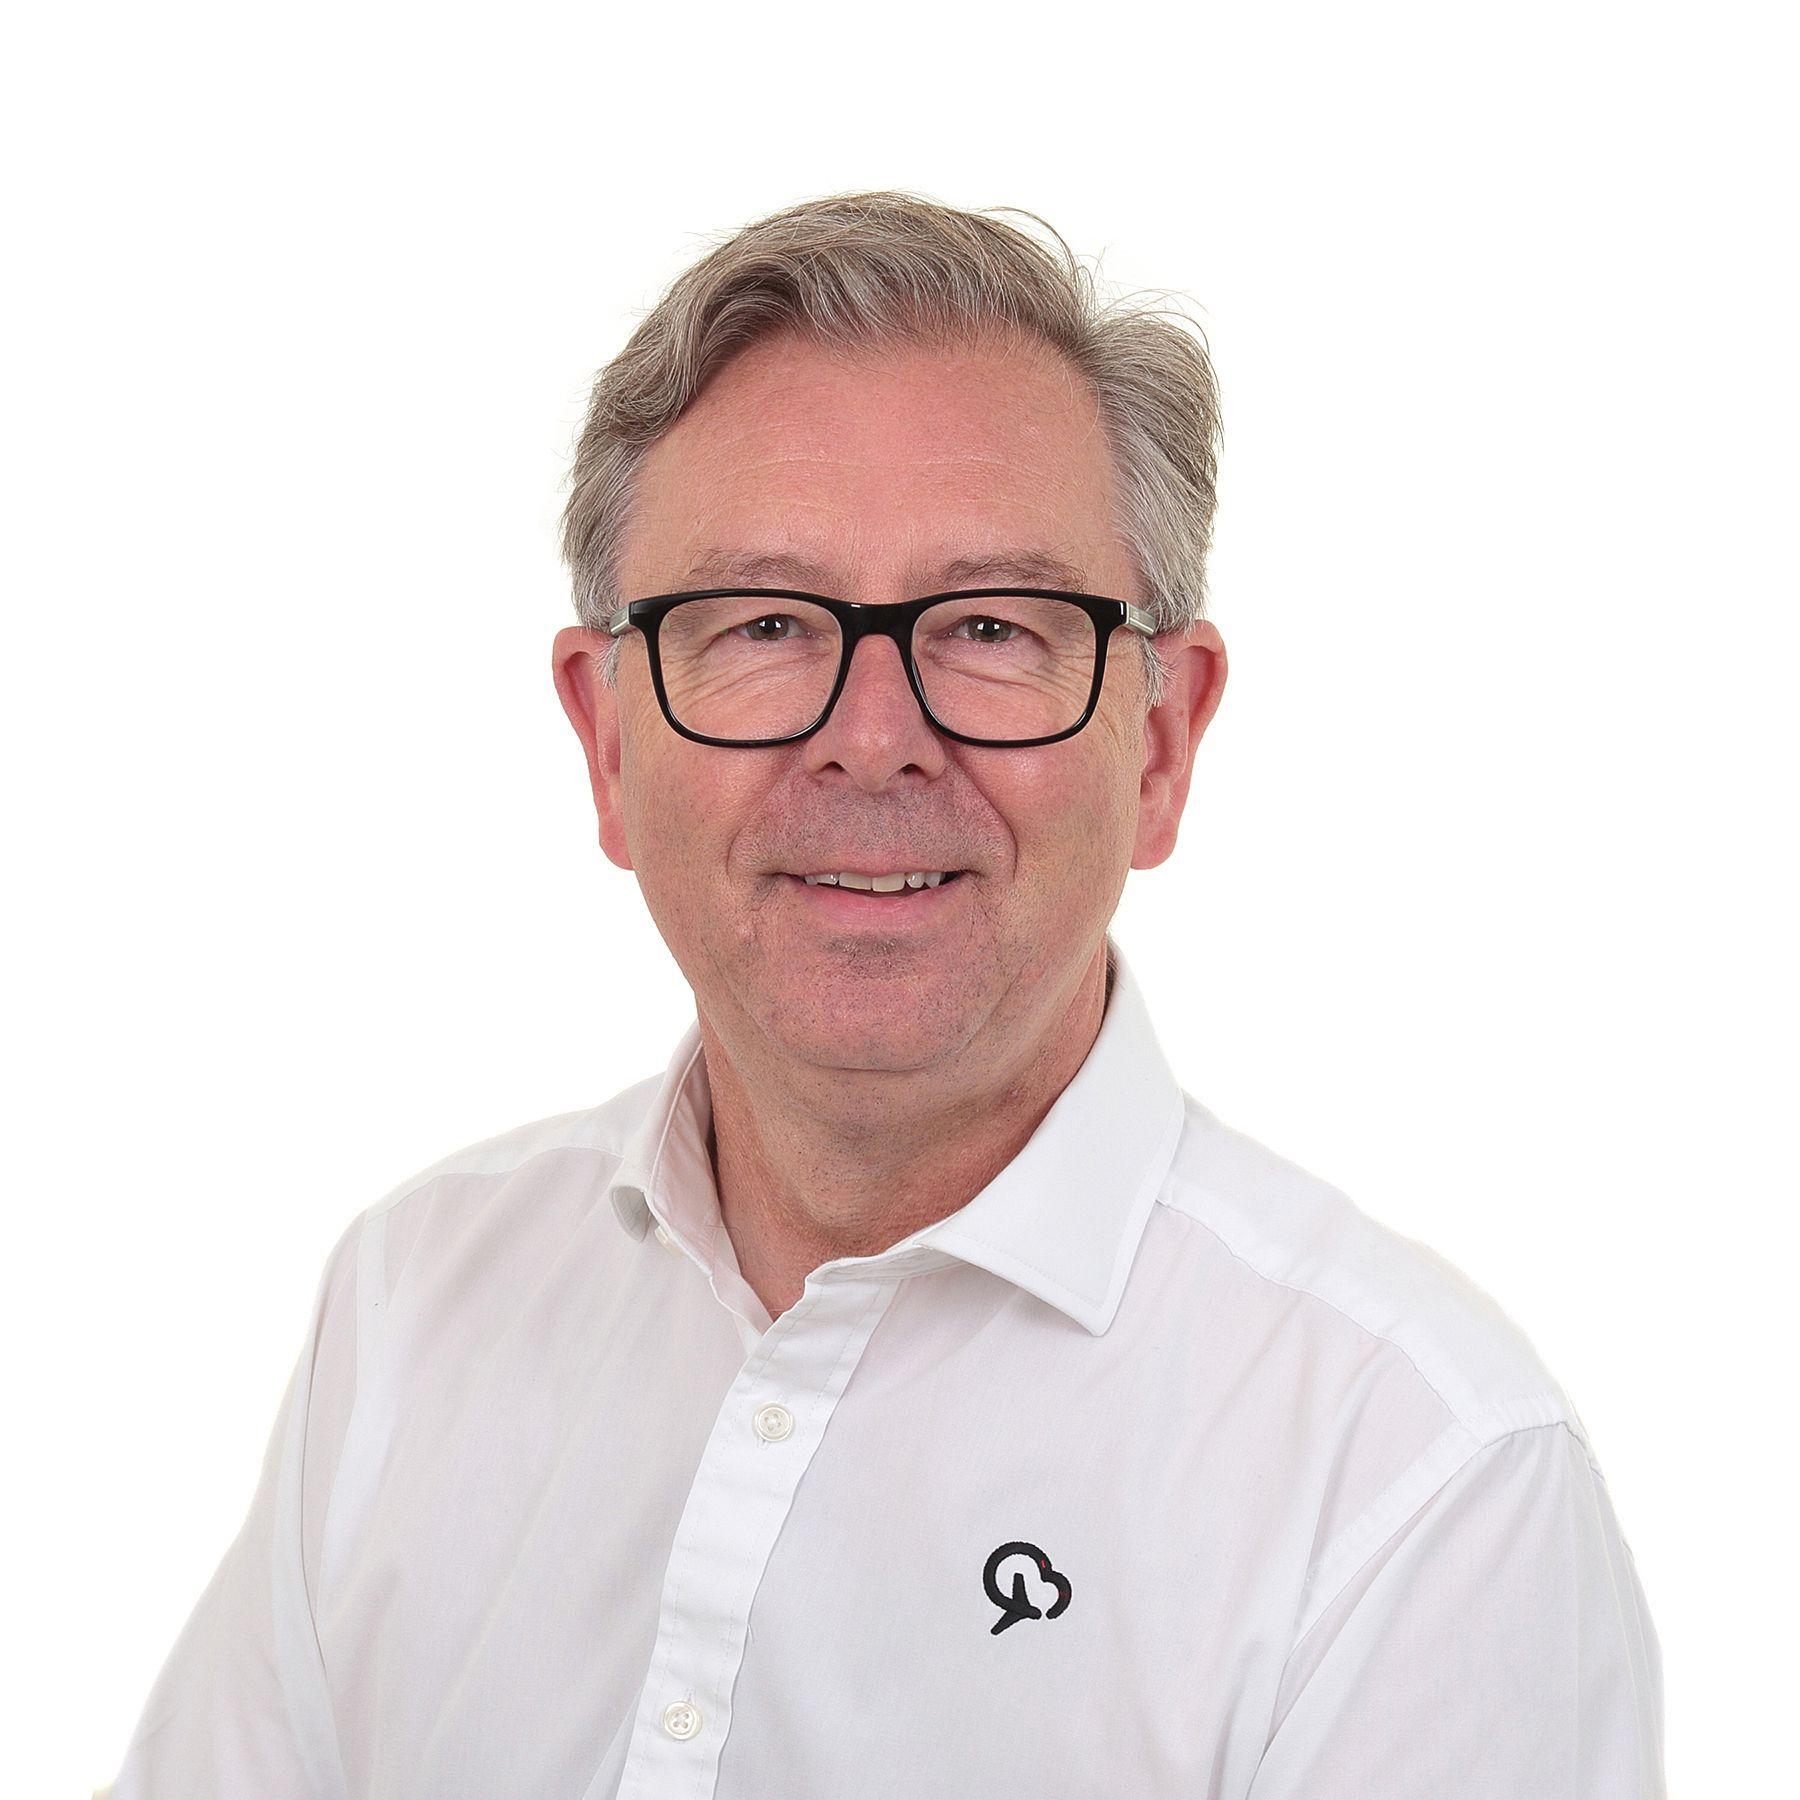 Photo of Ian Forde-Smith